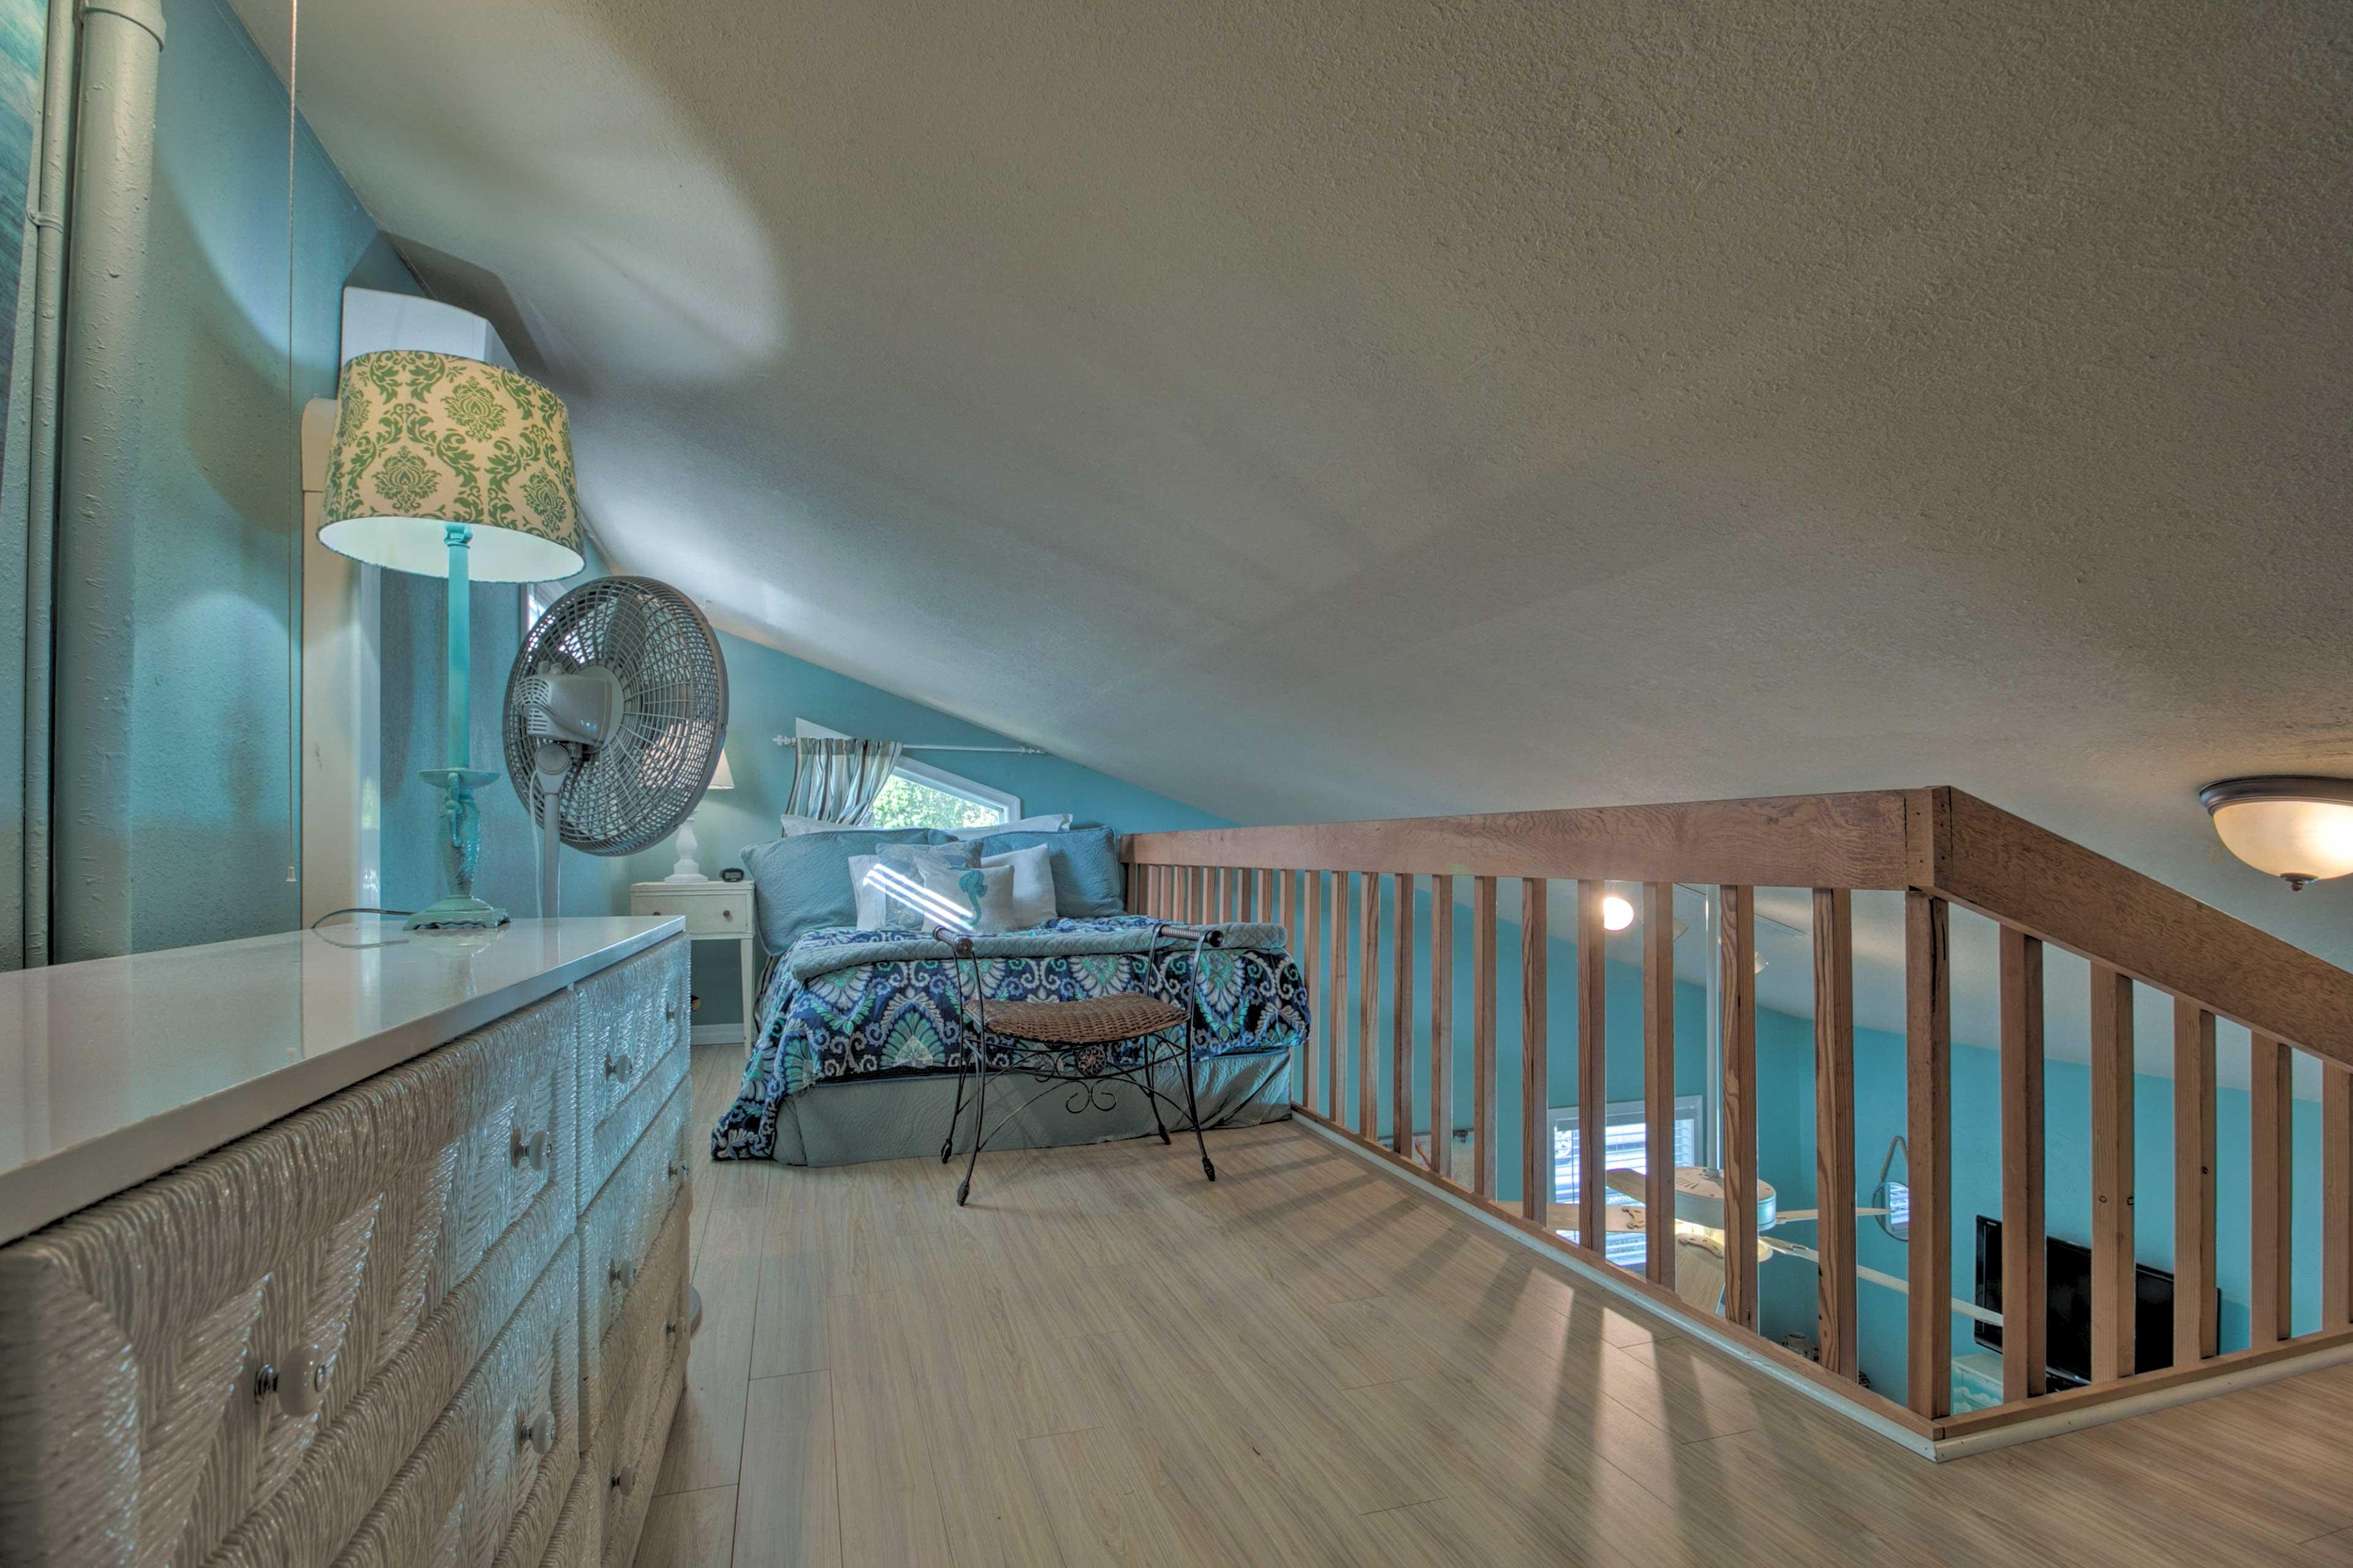 Bedroom/Loft | Queen Bed | Linens Provided